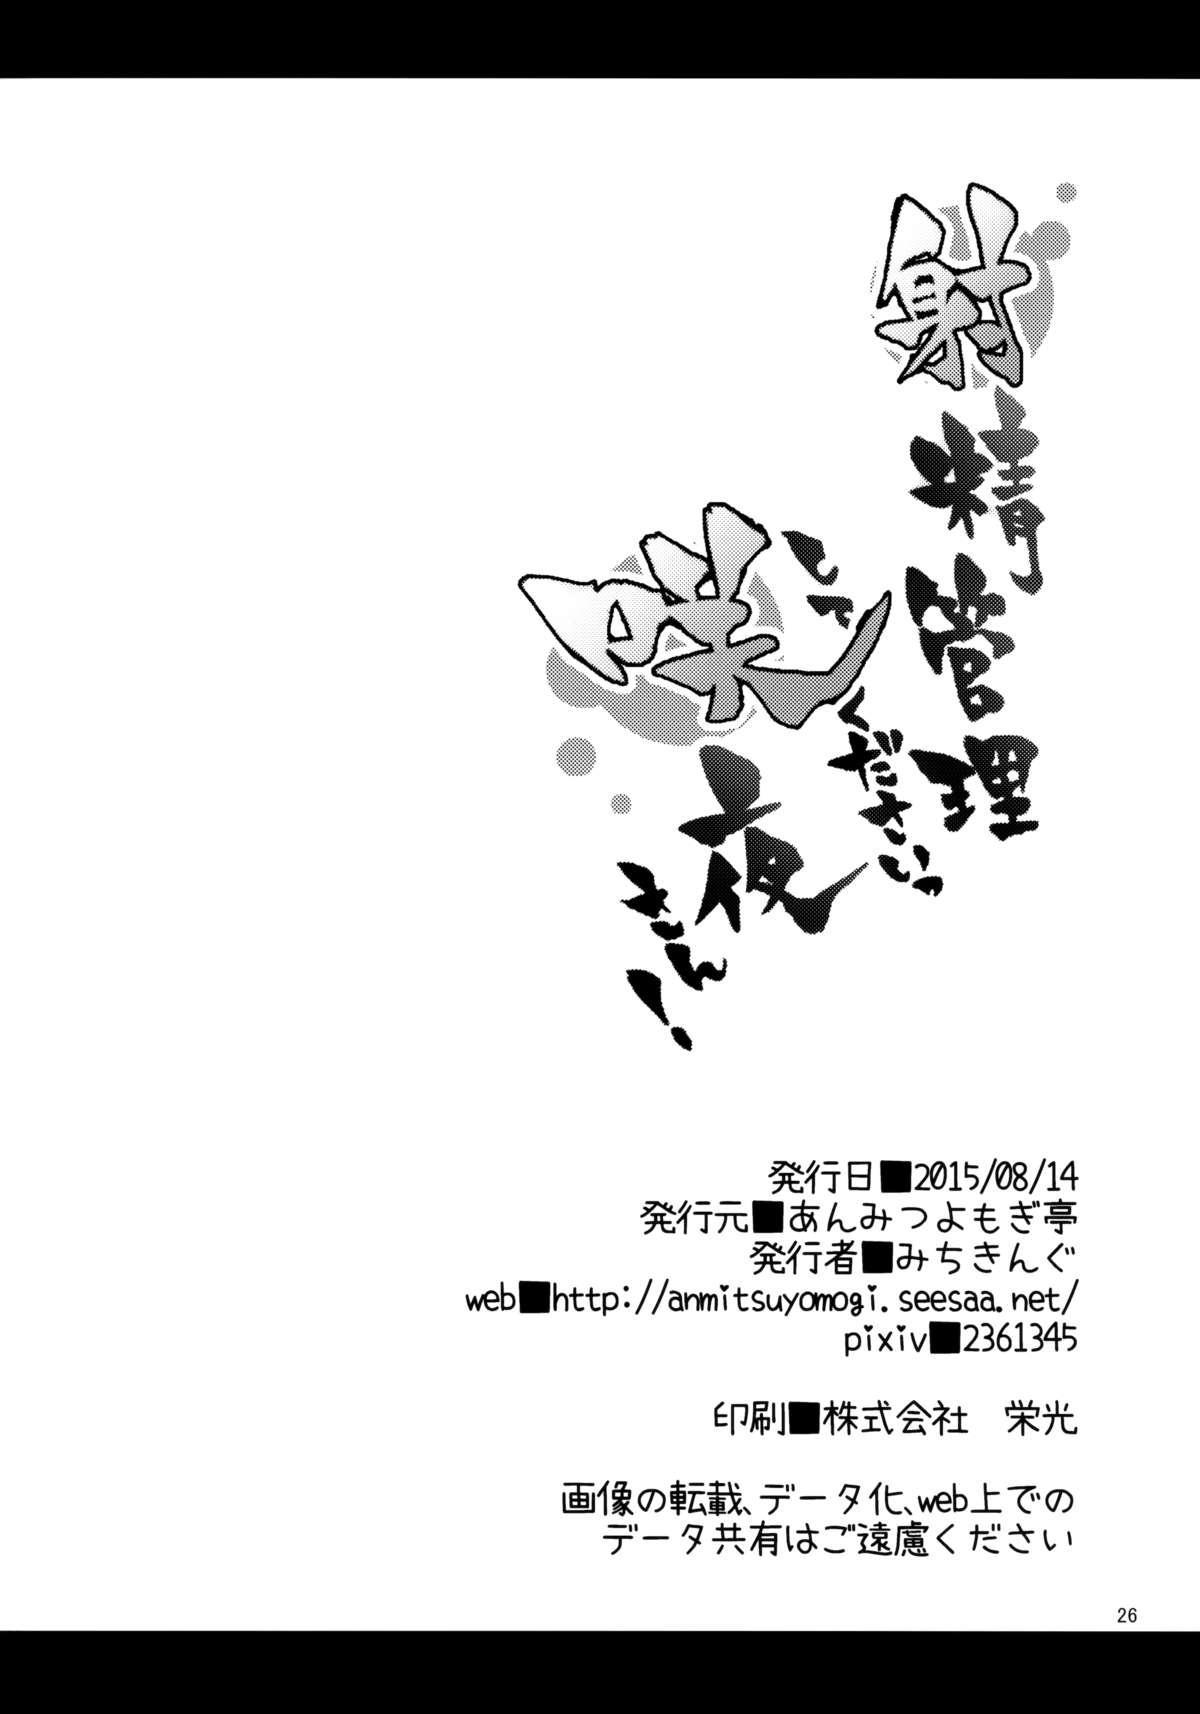 (C88) [Anmitsuyomogitei (Michiking)] Shasei Kanri Shite Kudasai Sakuya-san! | Take Care of My Ejaculations Please, Sakuya-san! (Touhou Project) [English] [PSYN+Facedesk] [Decensored by Anon] 24